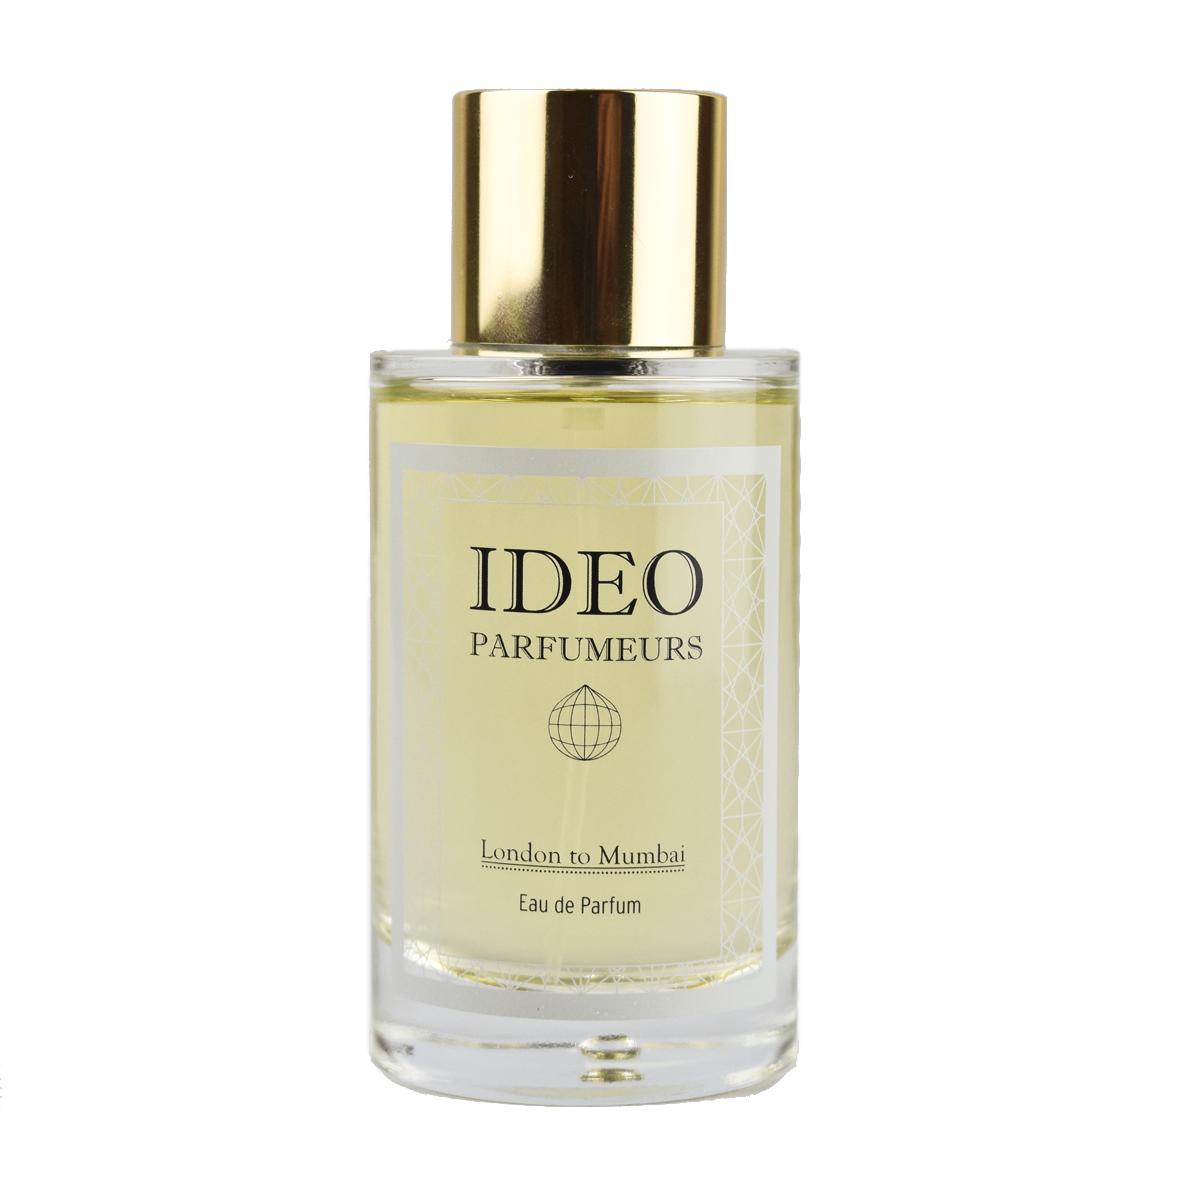 Ideo parfumeurs london to mumbai edp 100ml for Ideo products